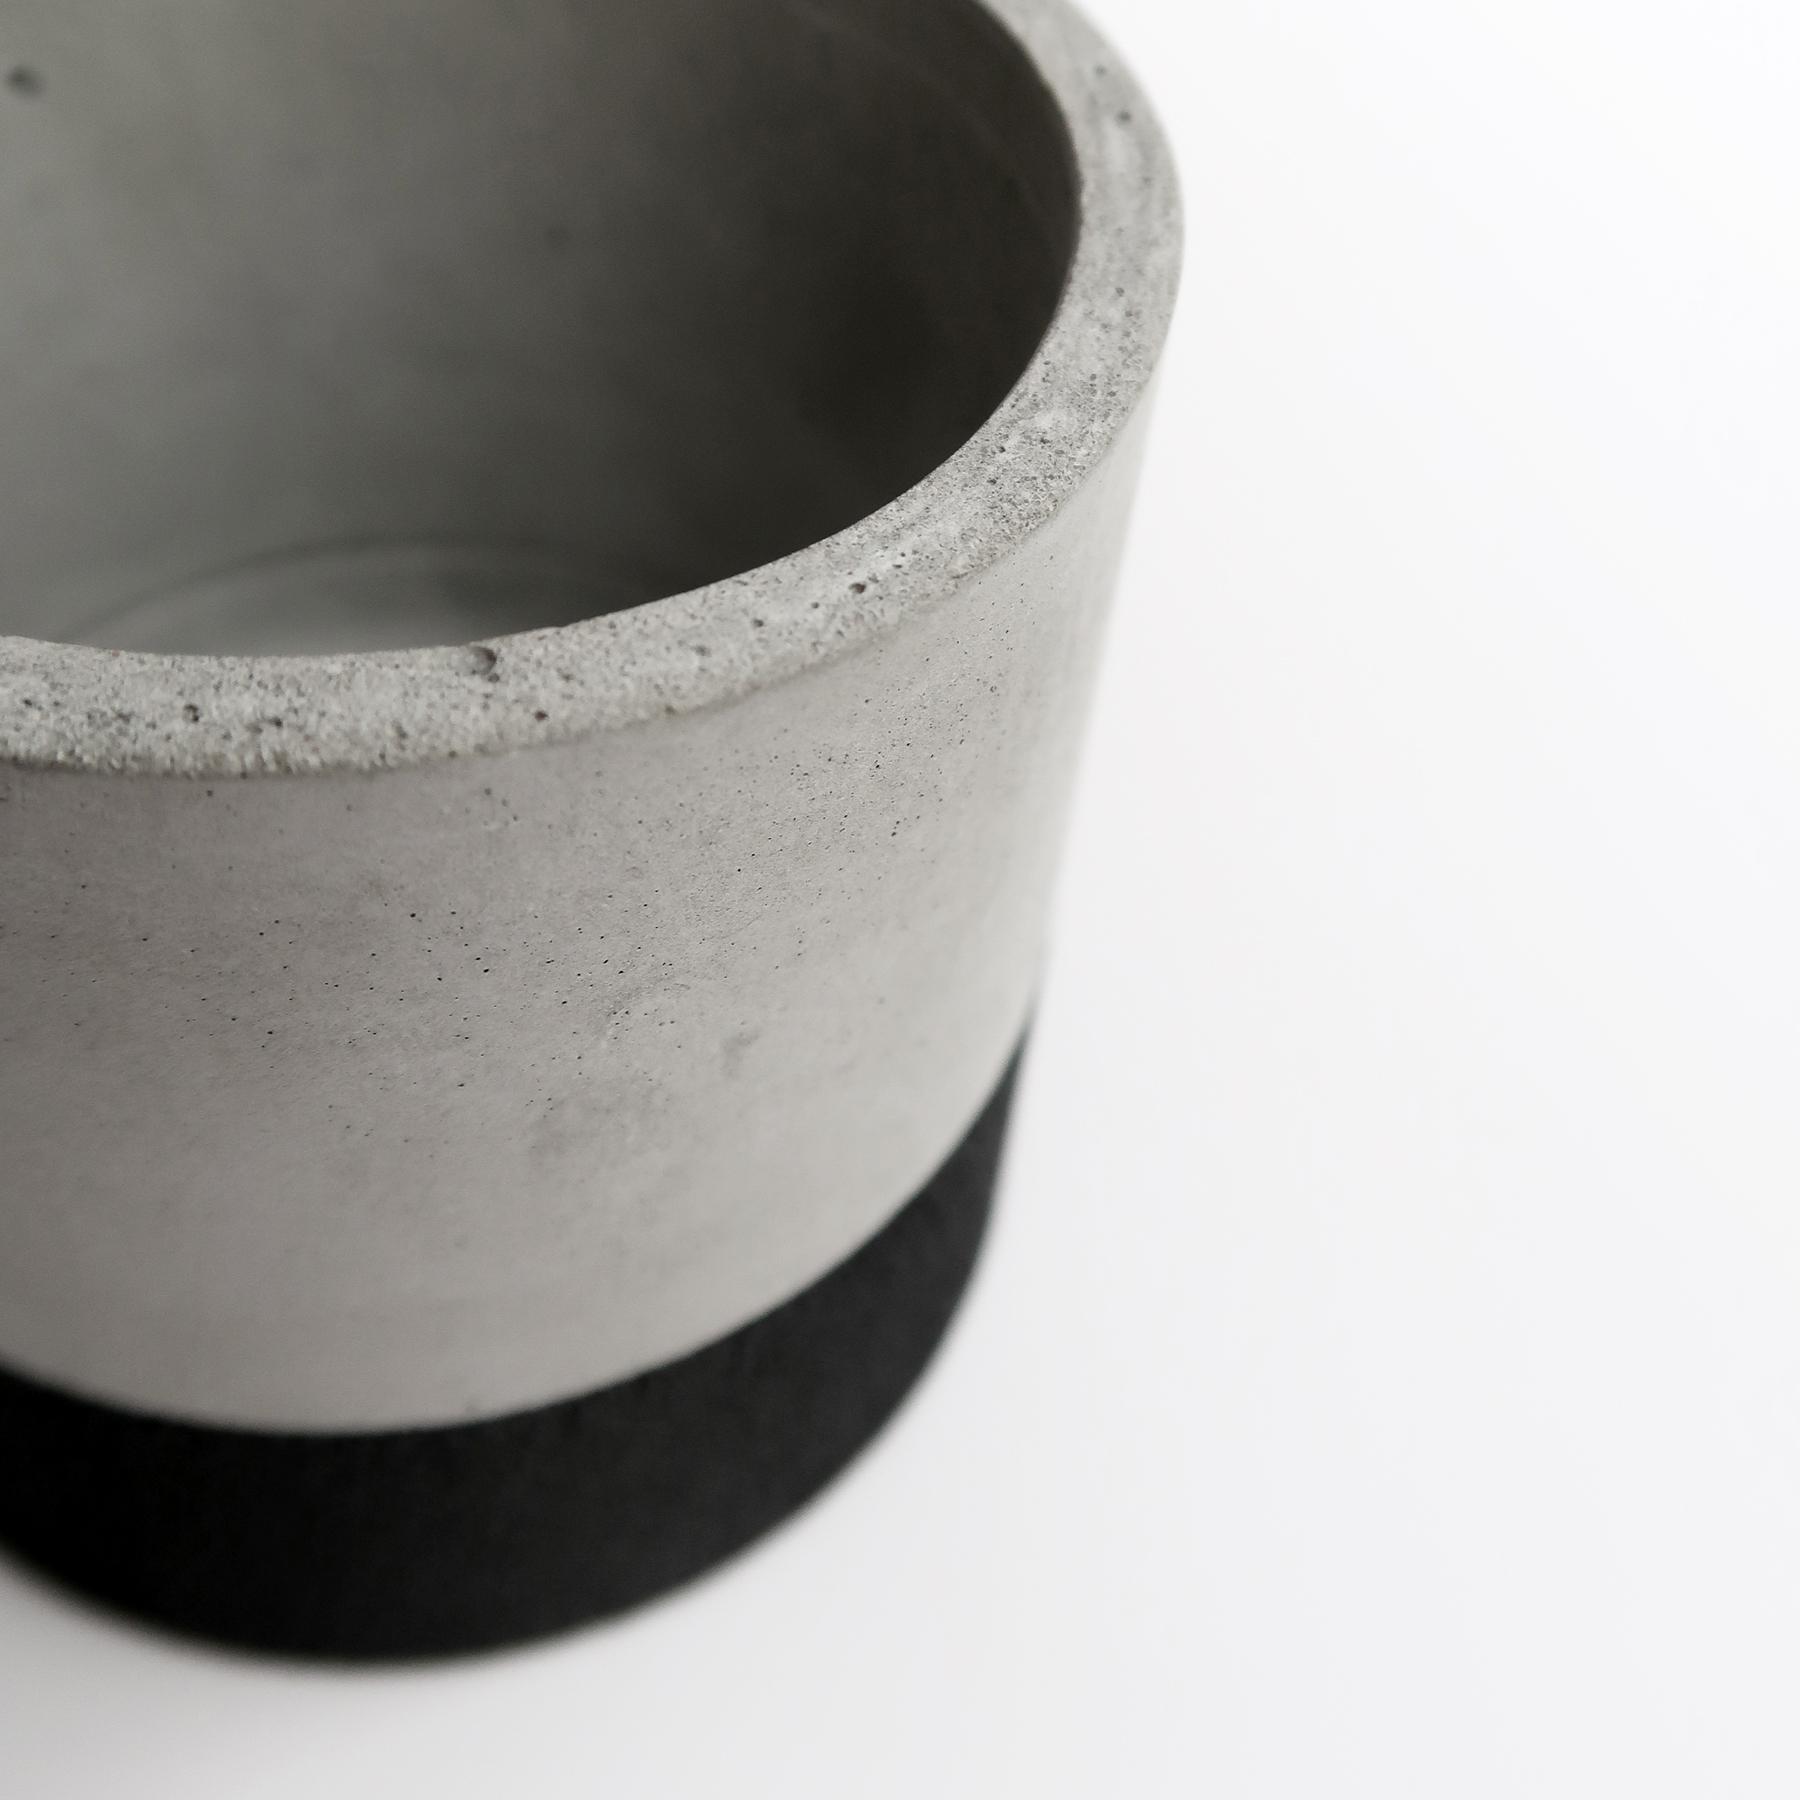 TEKTITE 黑隕石等圓水泥設計家飾・盆器・盆栽